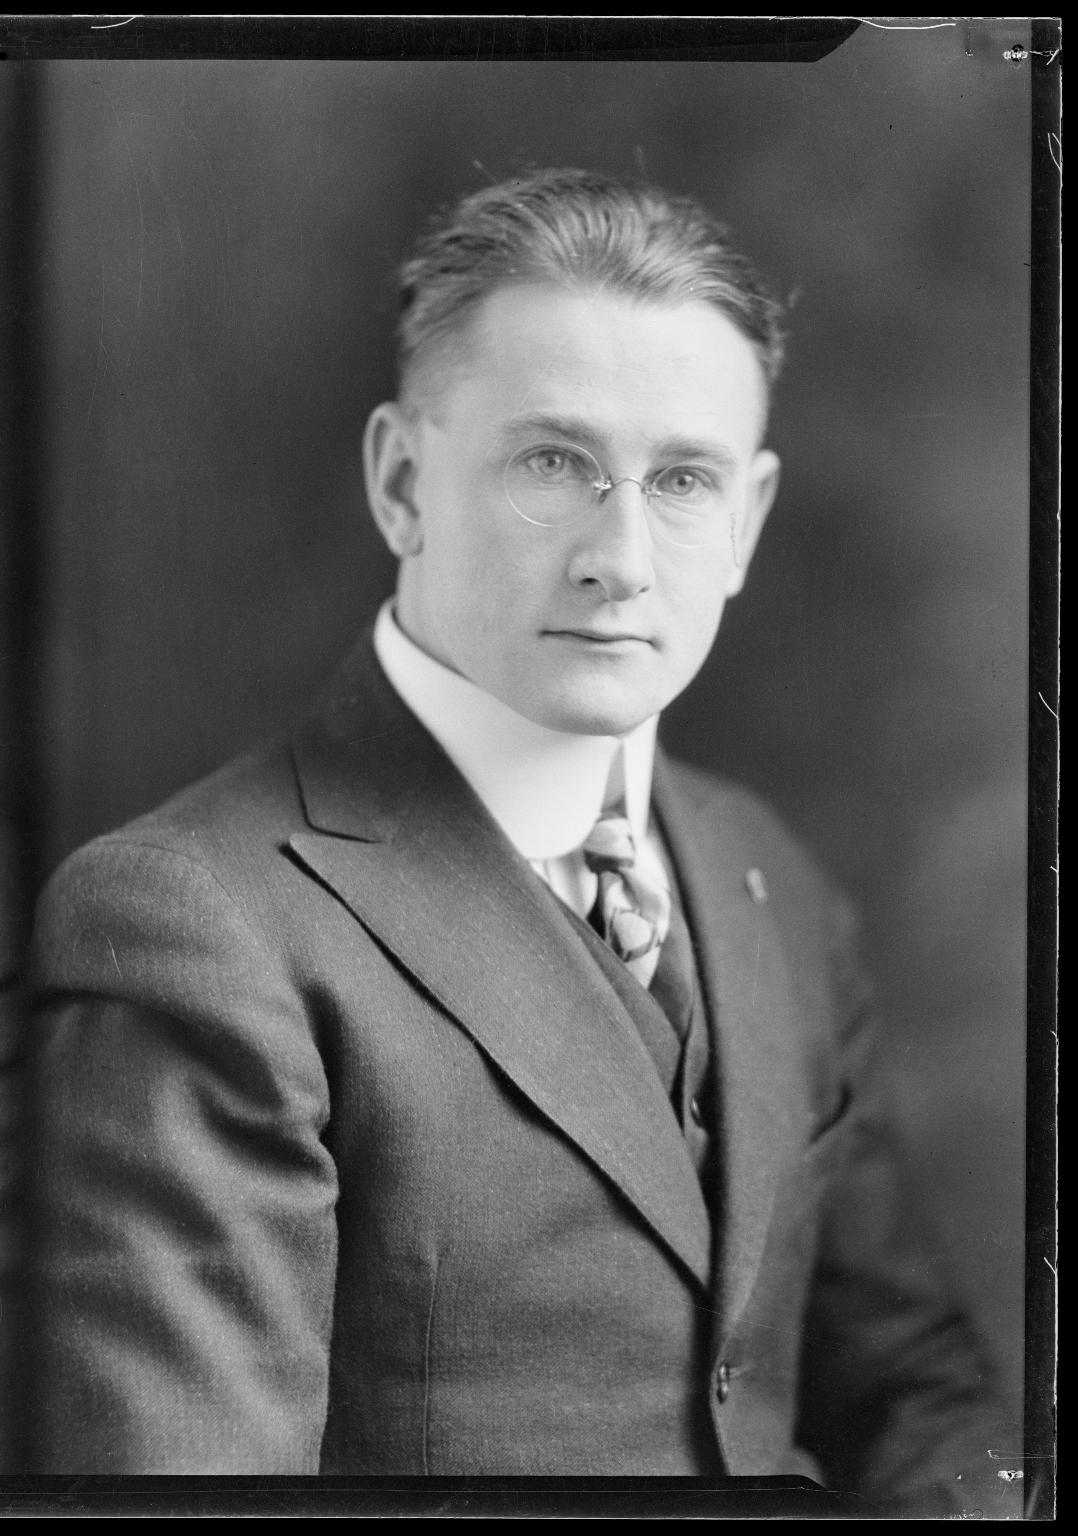 Portraits of V. E. Stamme